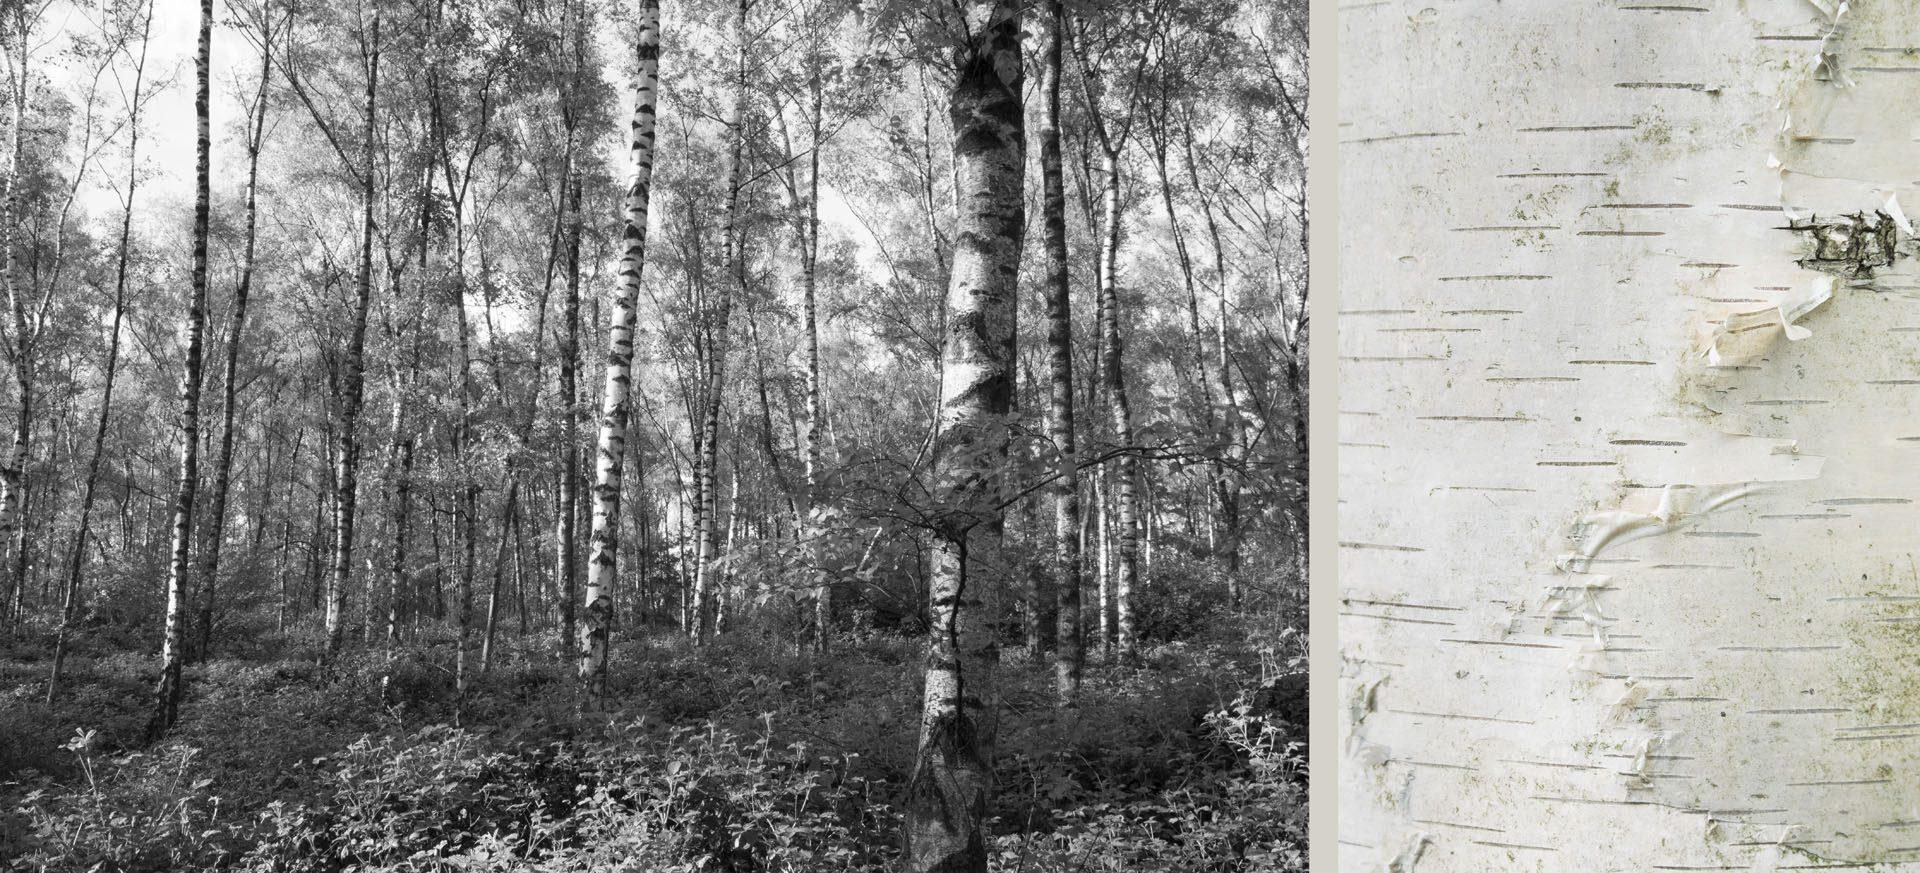 WaldRindenDoppel Birken III • Lambda-Print auf KODAK Pro Endura, Alu-Dibond®, 110 x 50 cm, gerahmt als Art-Box • Auflage: 5 + 2 Artist's Proof